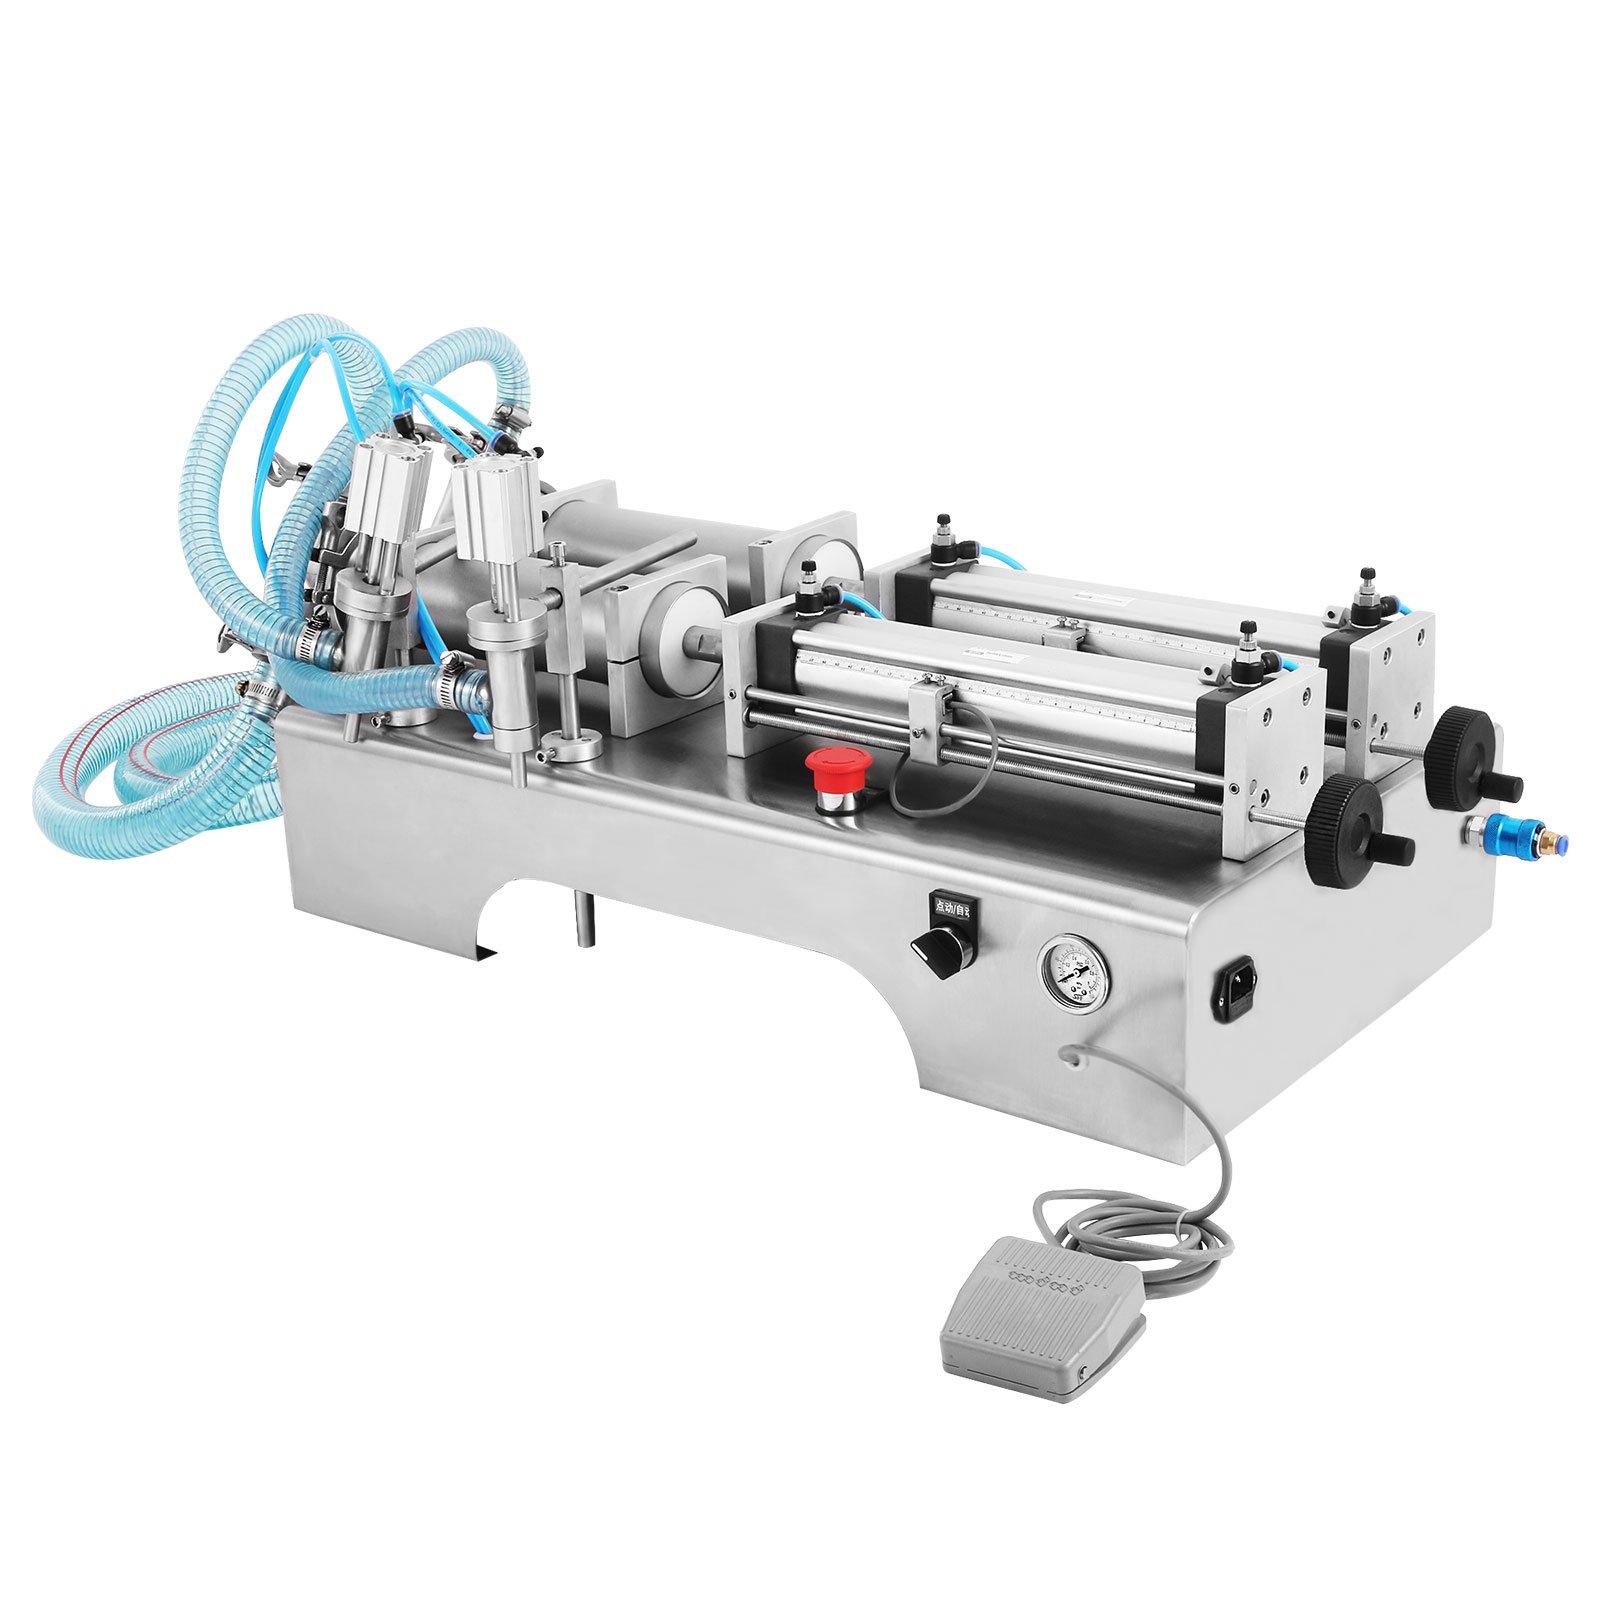 Happybuy 100-1000ML Pneumatic Liquid Filling Machine 20-60 bottles/min Horizontal Semi-auto Liquid Paste Filling Machine Two Head Pneumatic Filling Machinefor Liquid Oil Cream (100-1000ML Two Head)